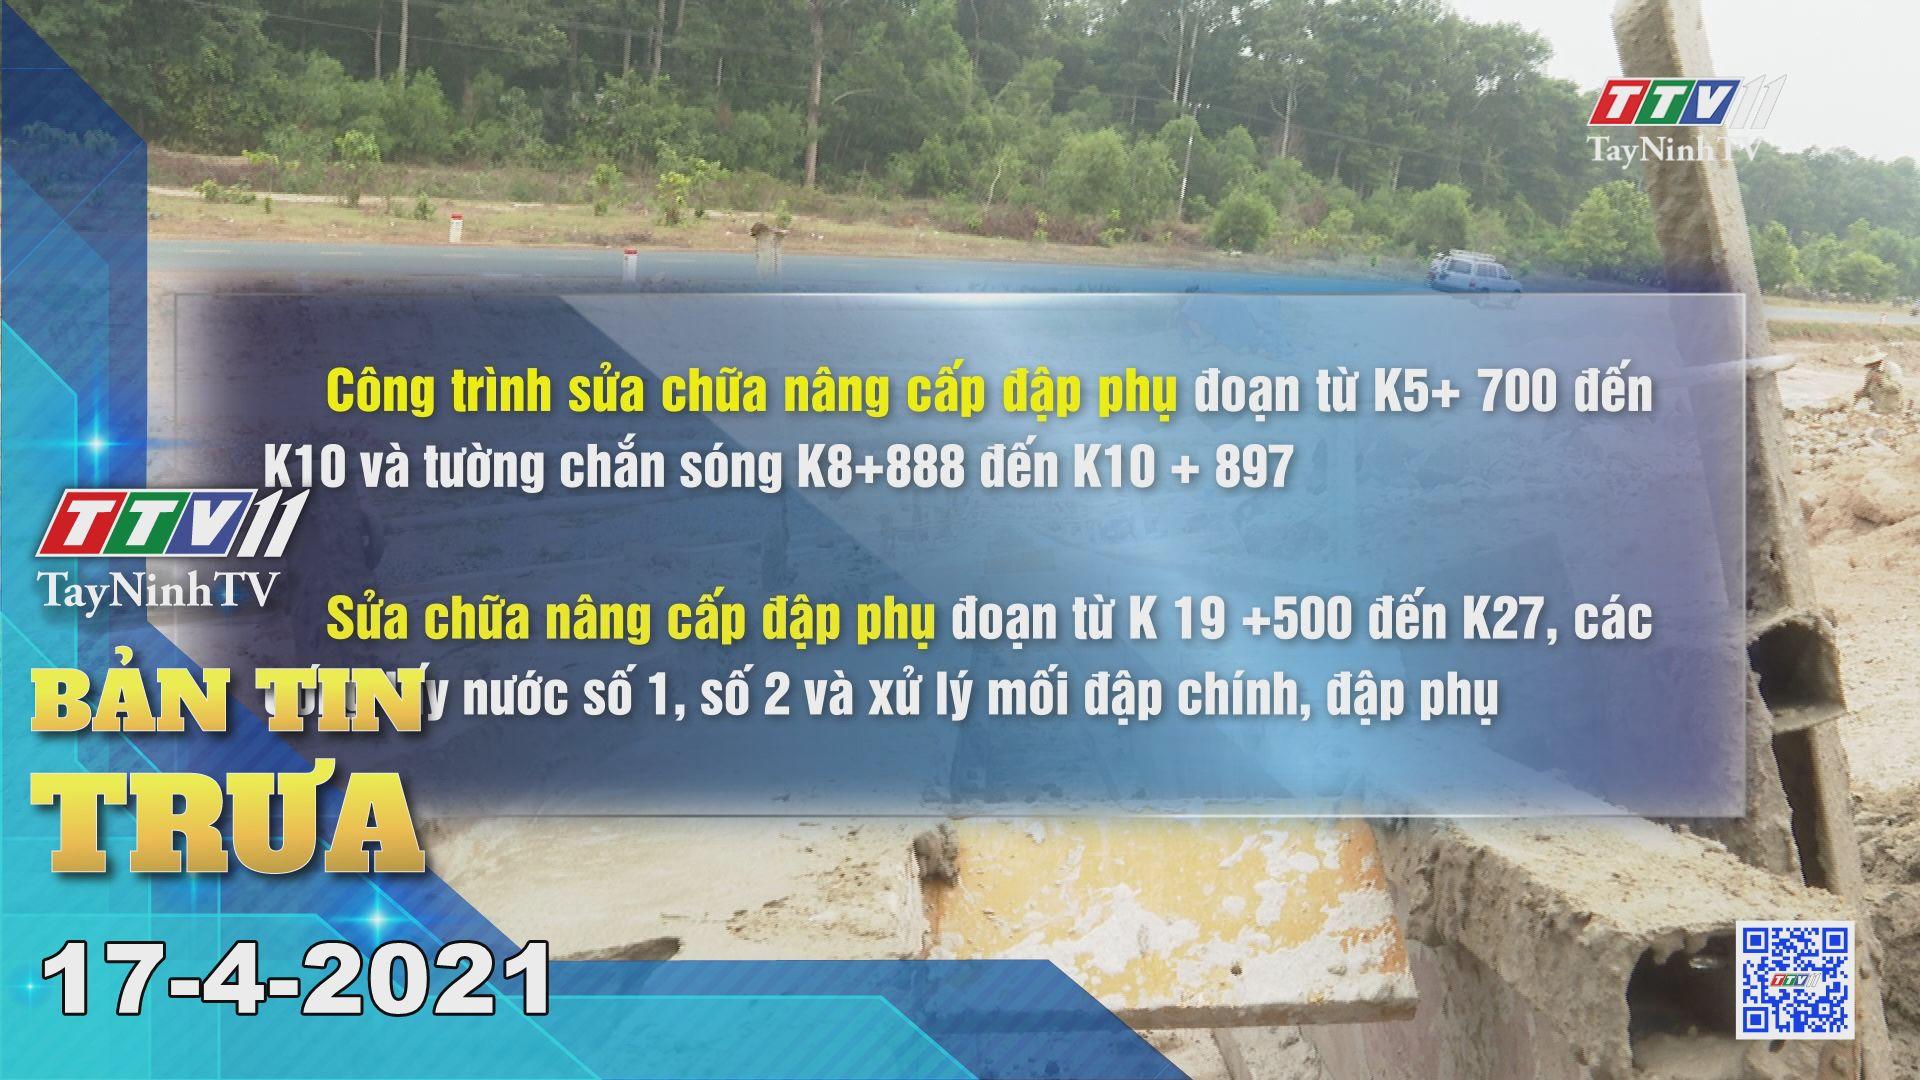 Bản tin trưa 17-4-2021 | Tin tức hôm nay | TayNinhTV